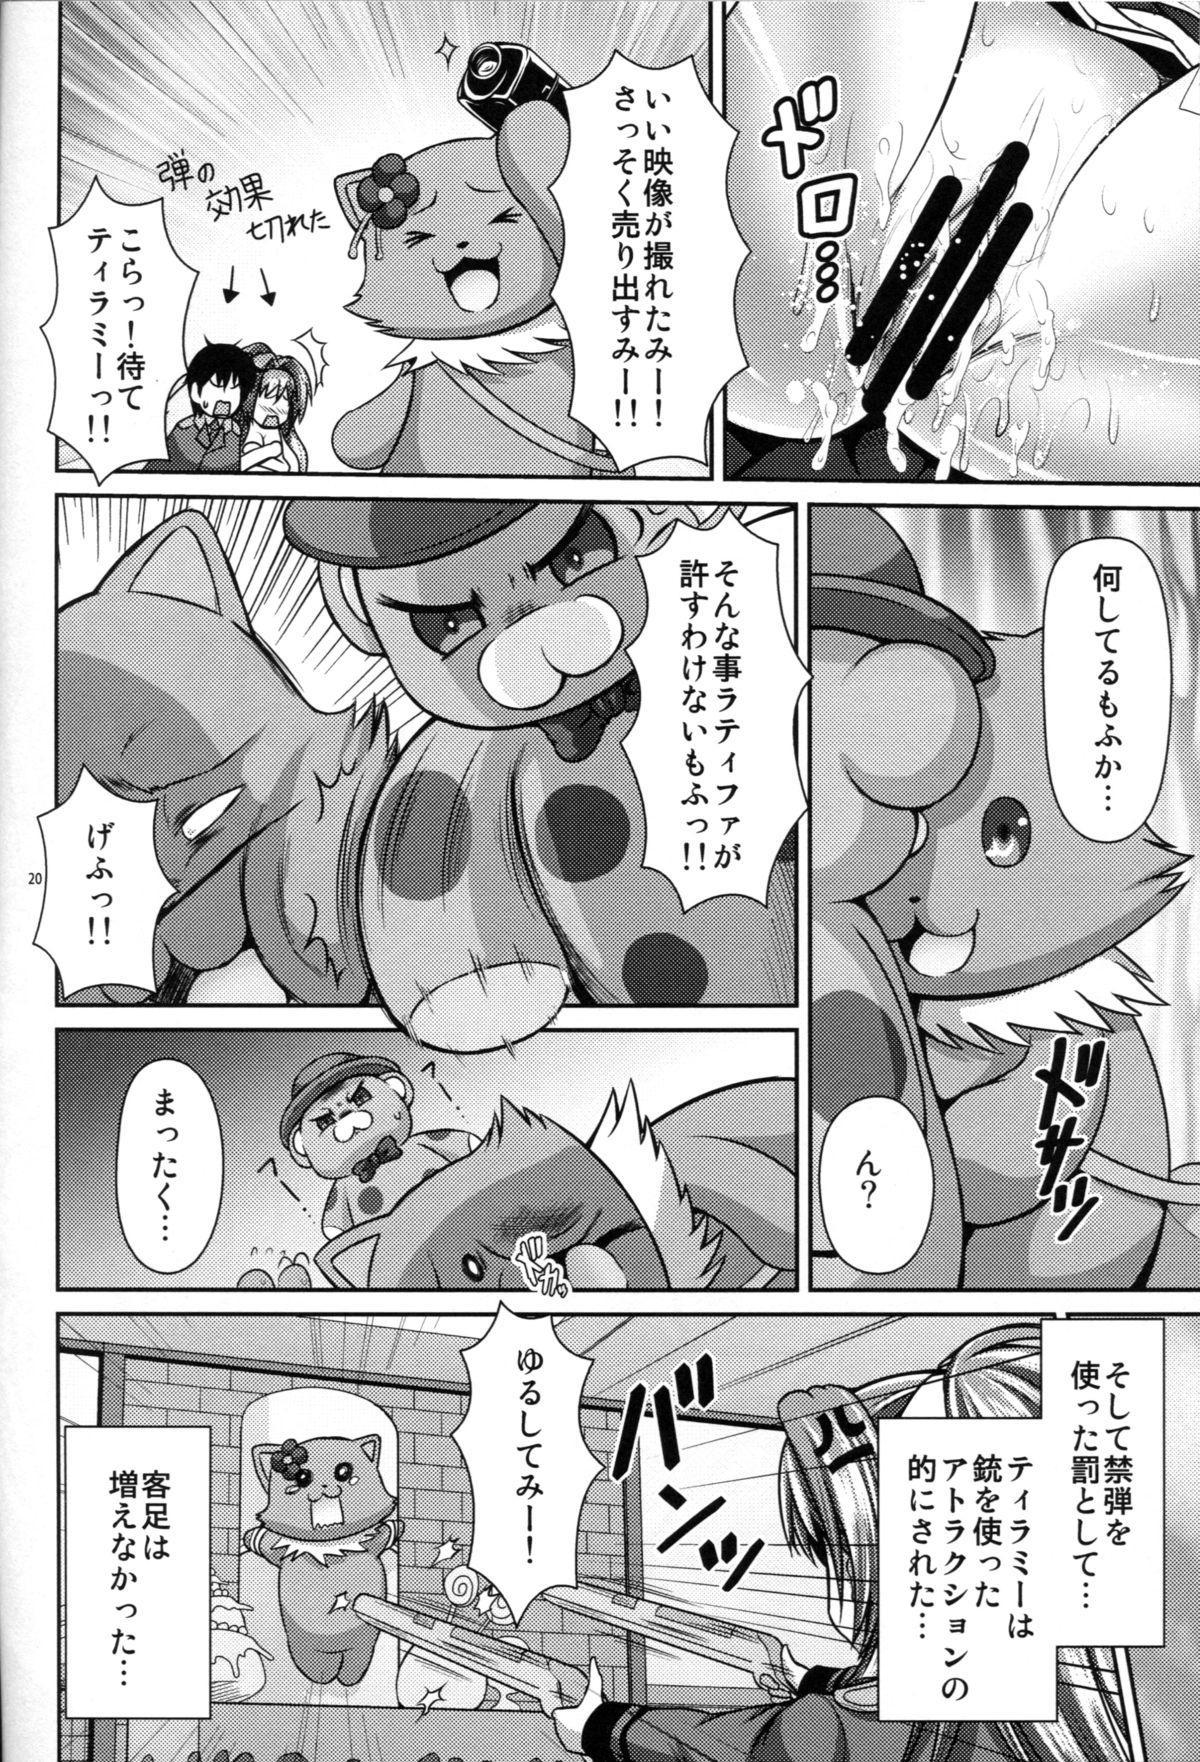 Ecchii Kimochi ga Tomannai! 18